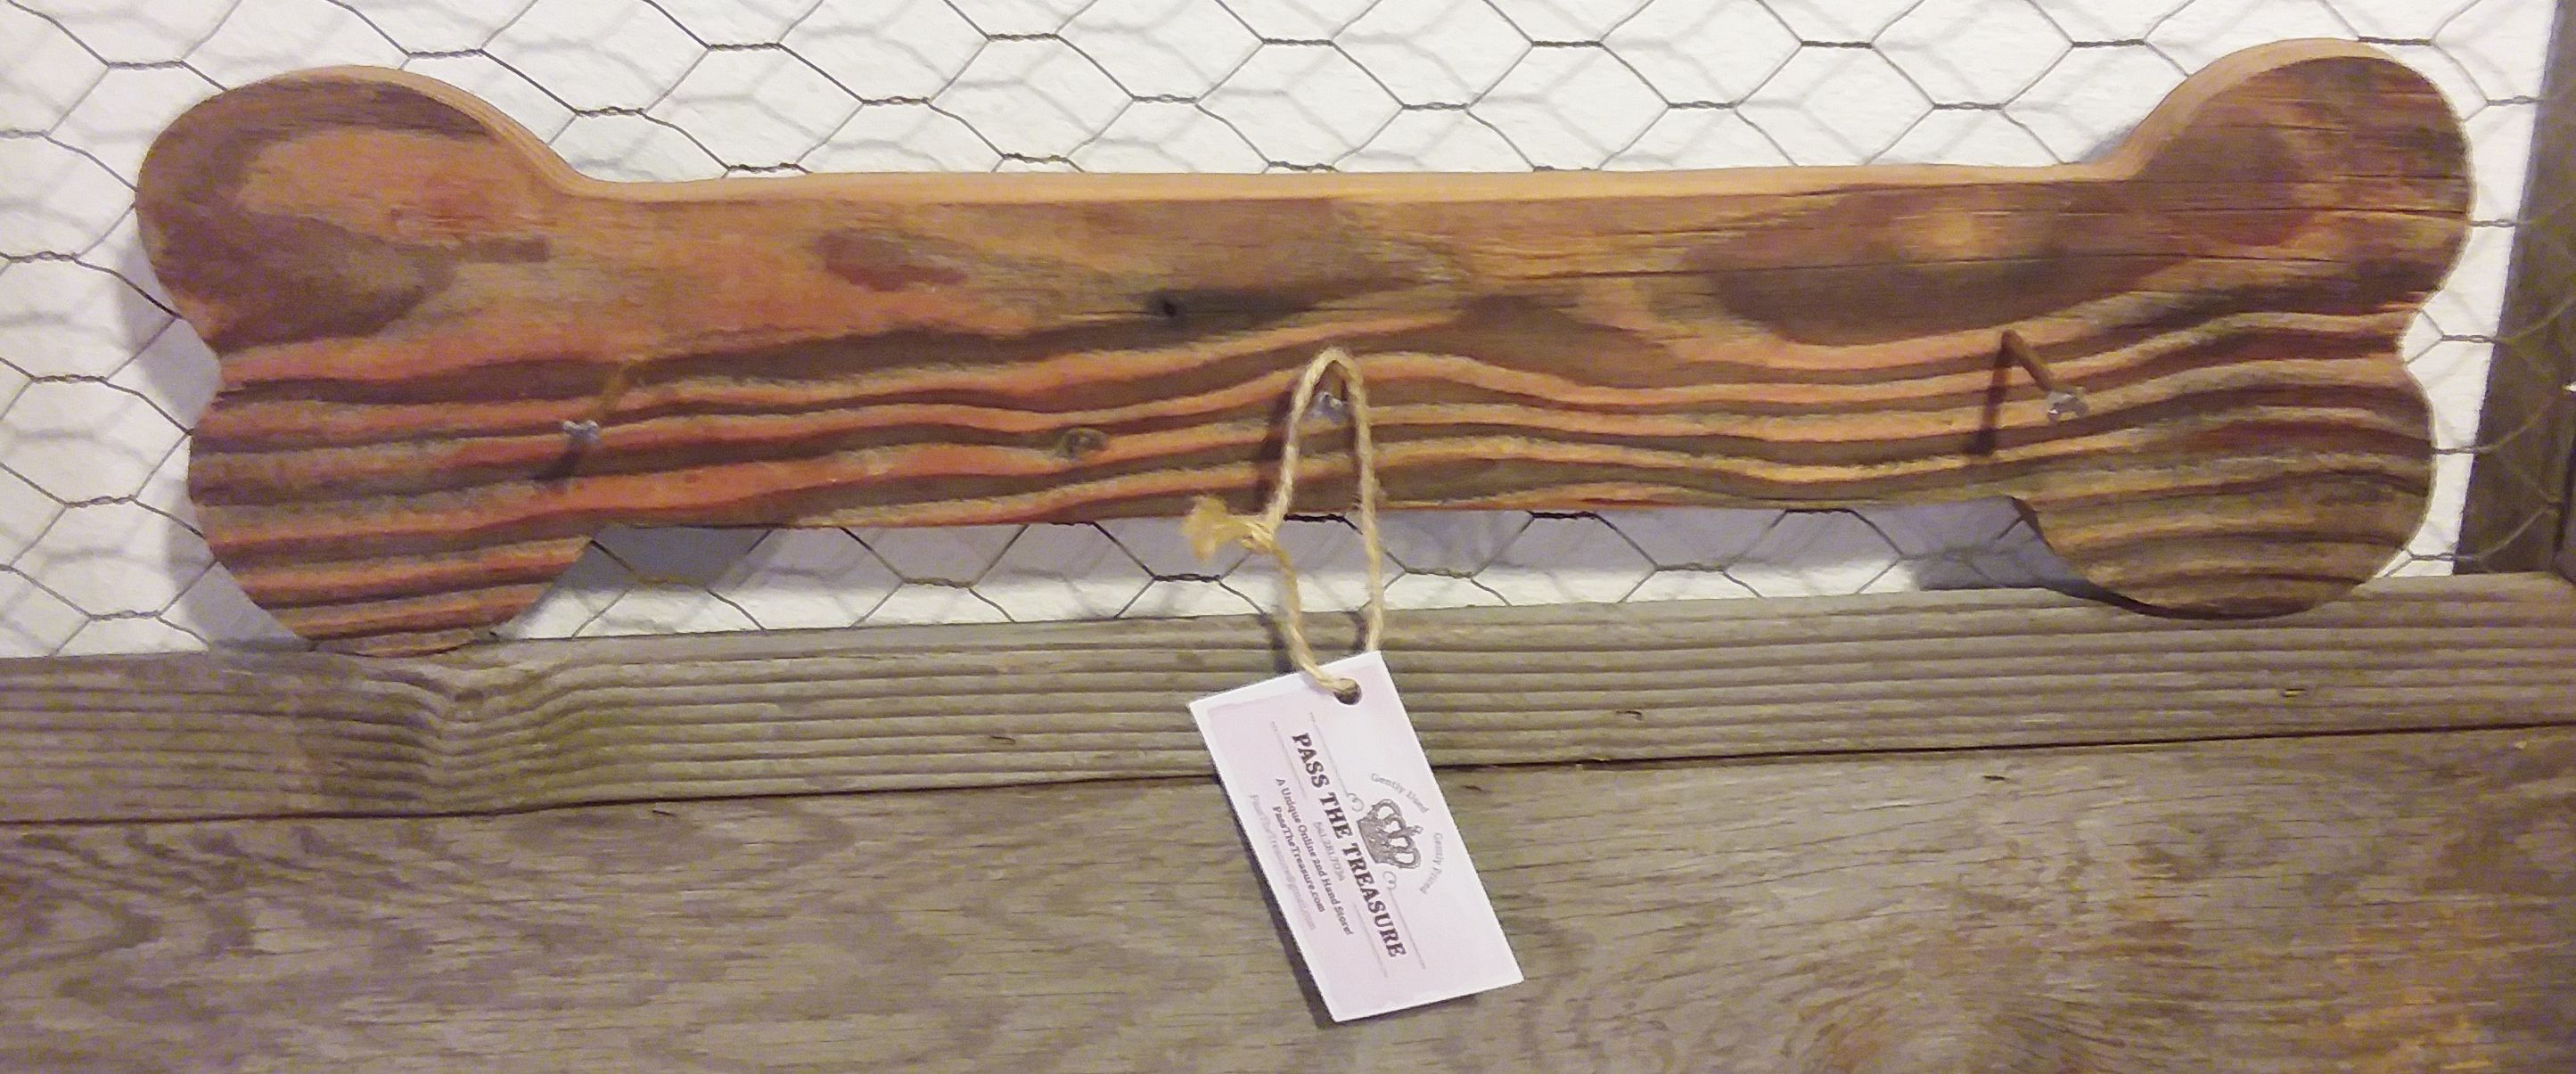 Custom Made Wood Dog Bone Hanger With Bone Shaped Nails Made From